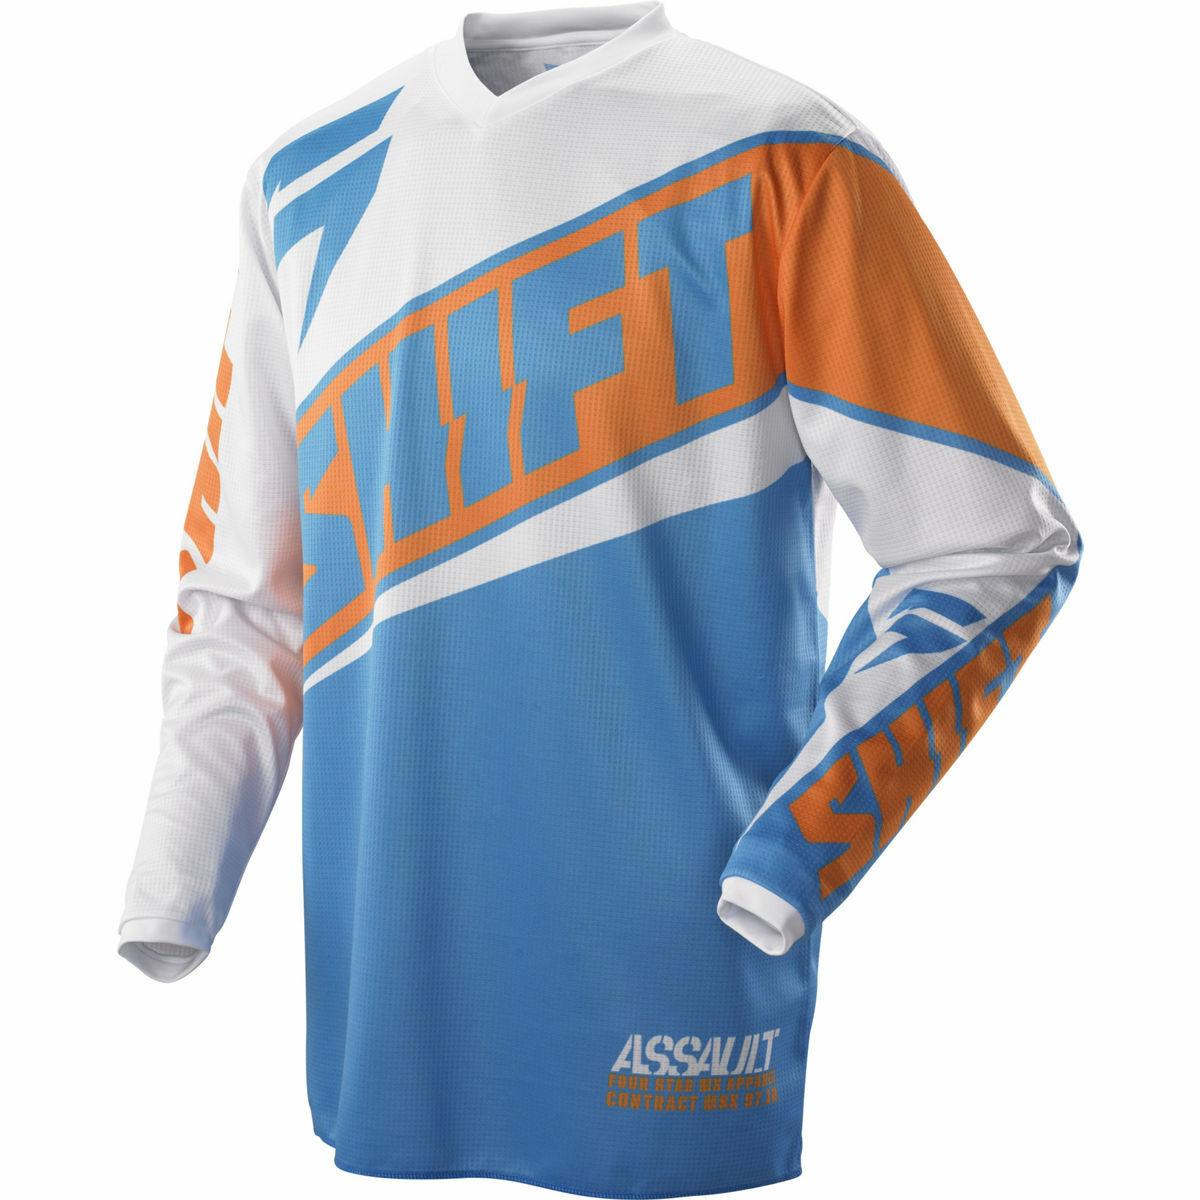 Neuf Maillot Motocross Shift Racing Assault Race Orange Bleu Blanc Enduro PROMO